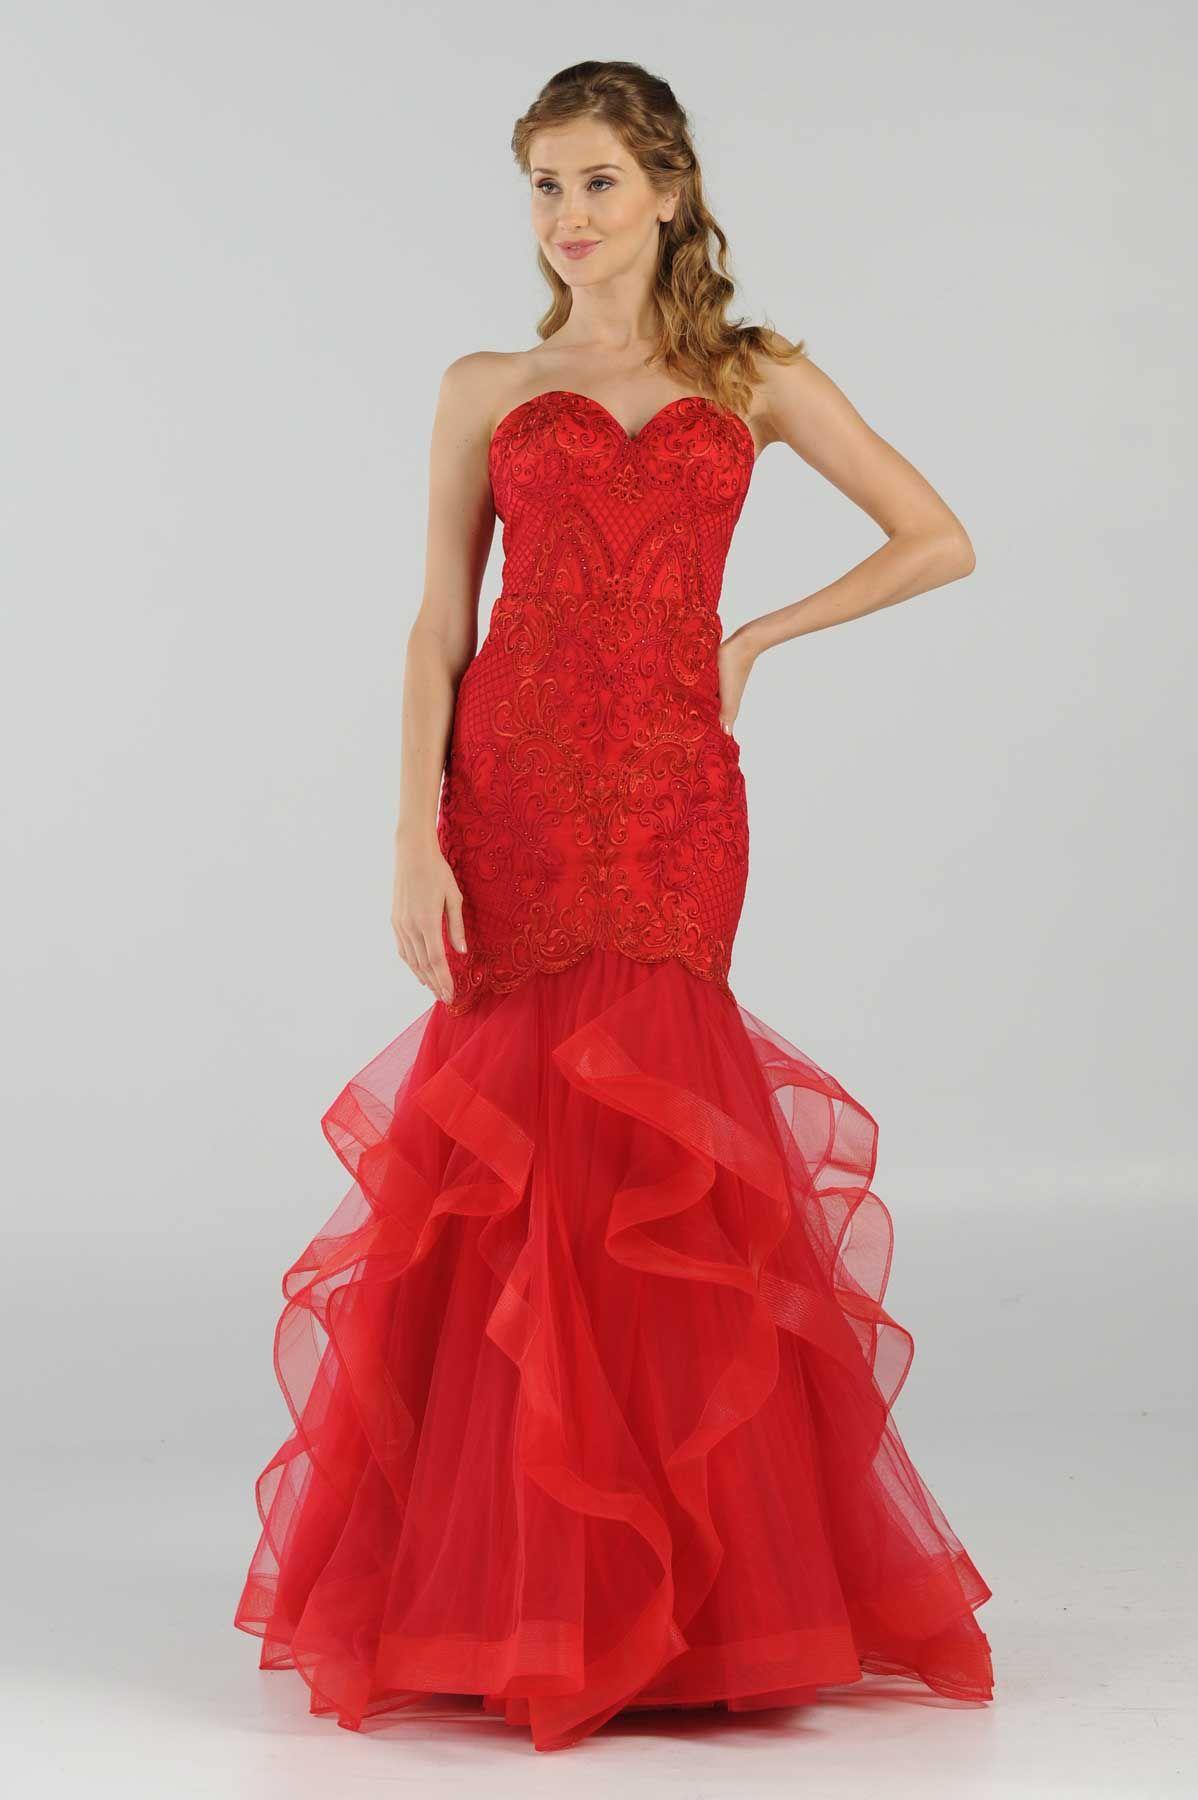 PROM DRESSES / 8198   Prom Dresses and Women Formal Dresses ...